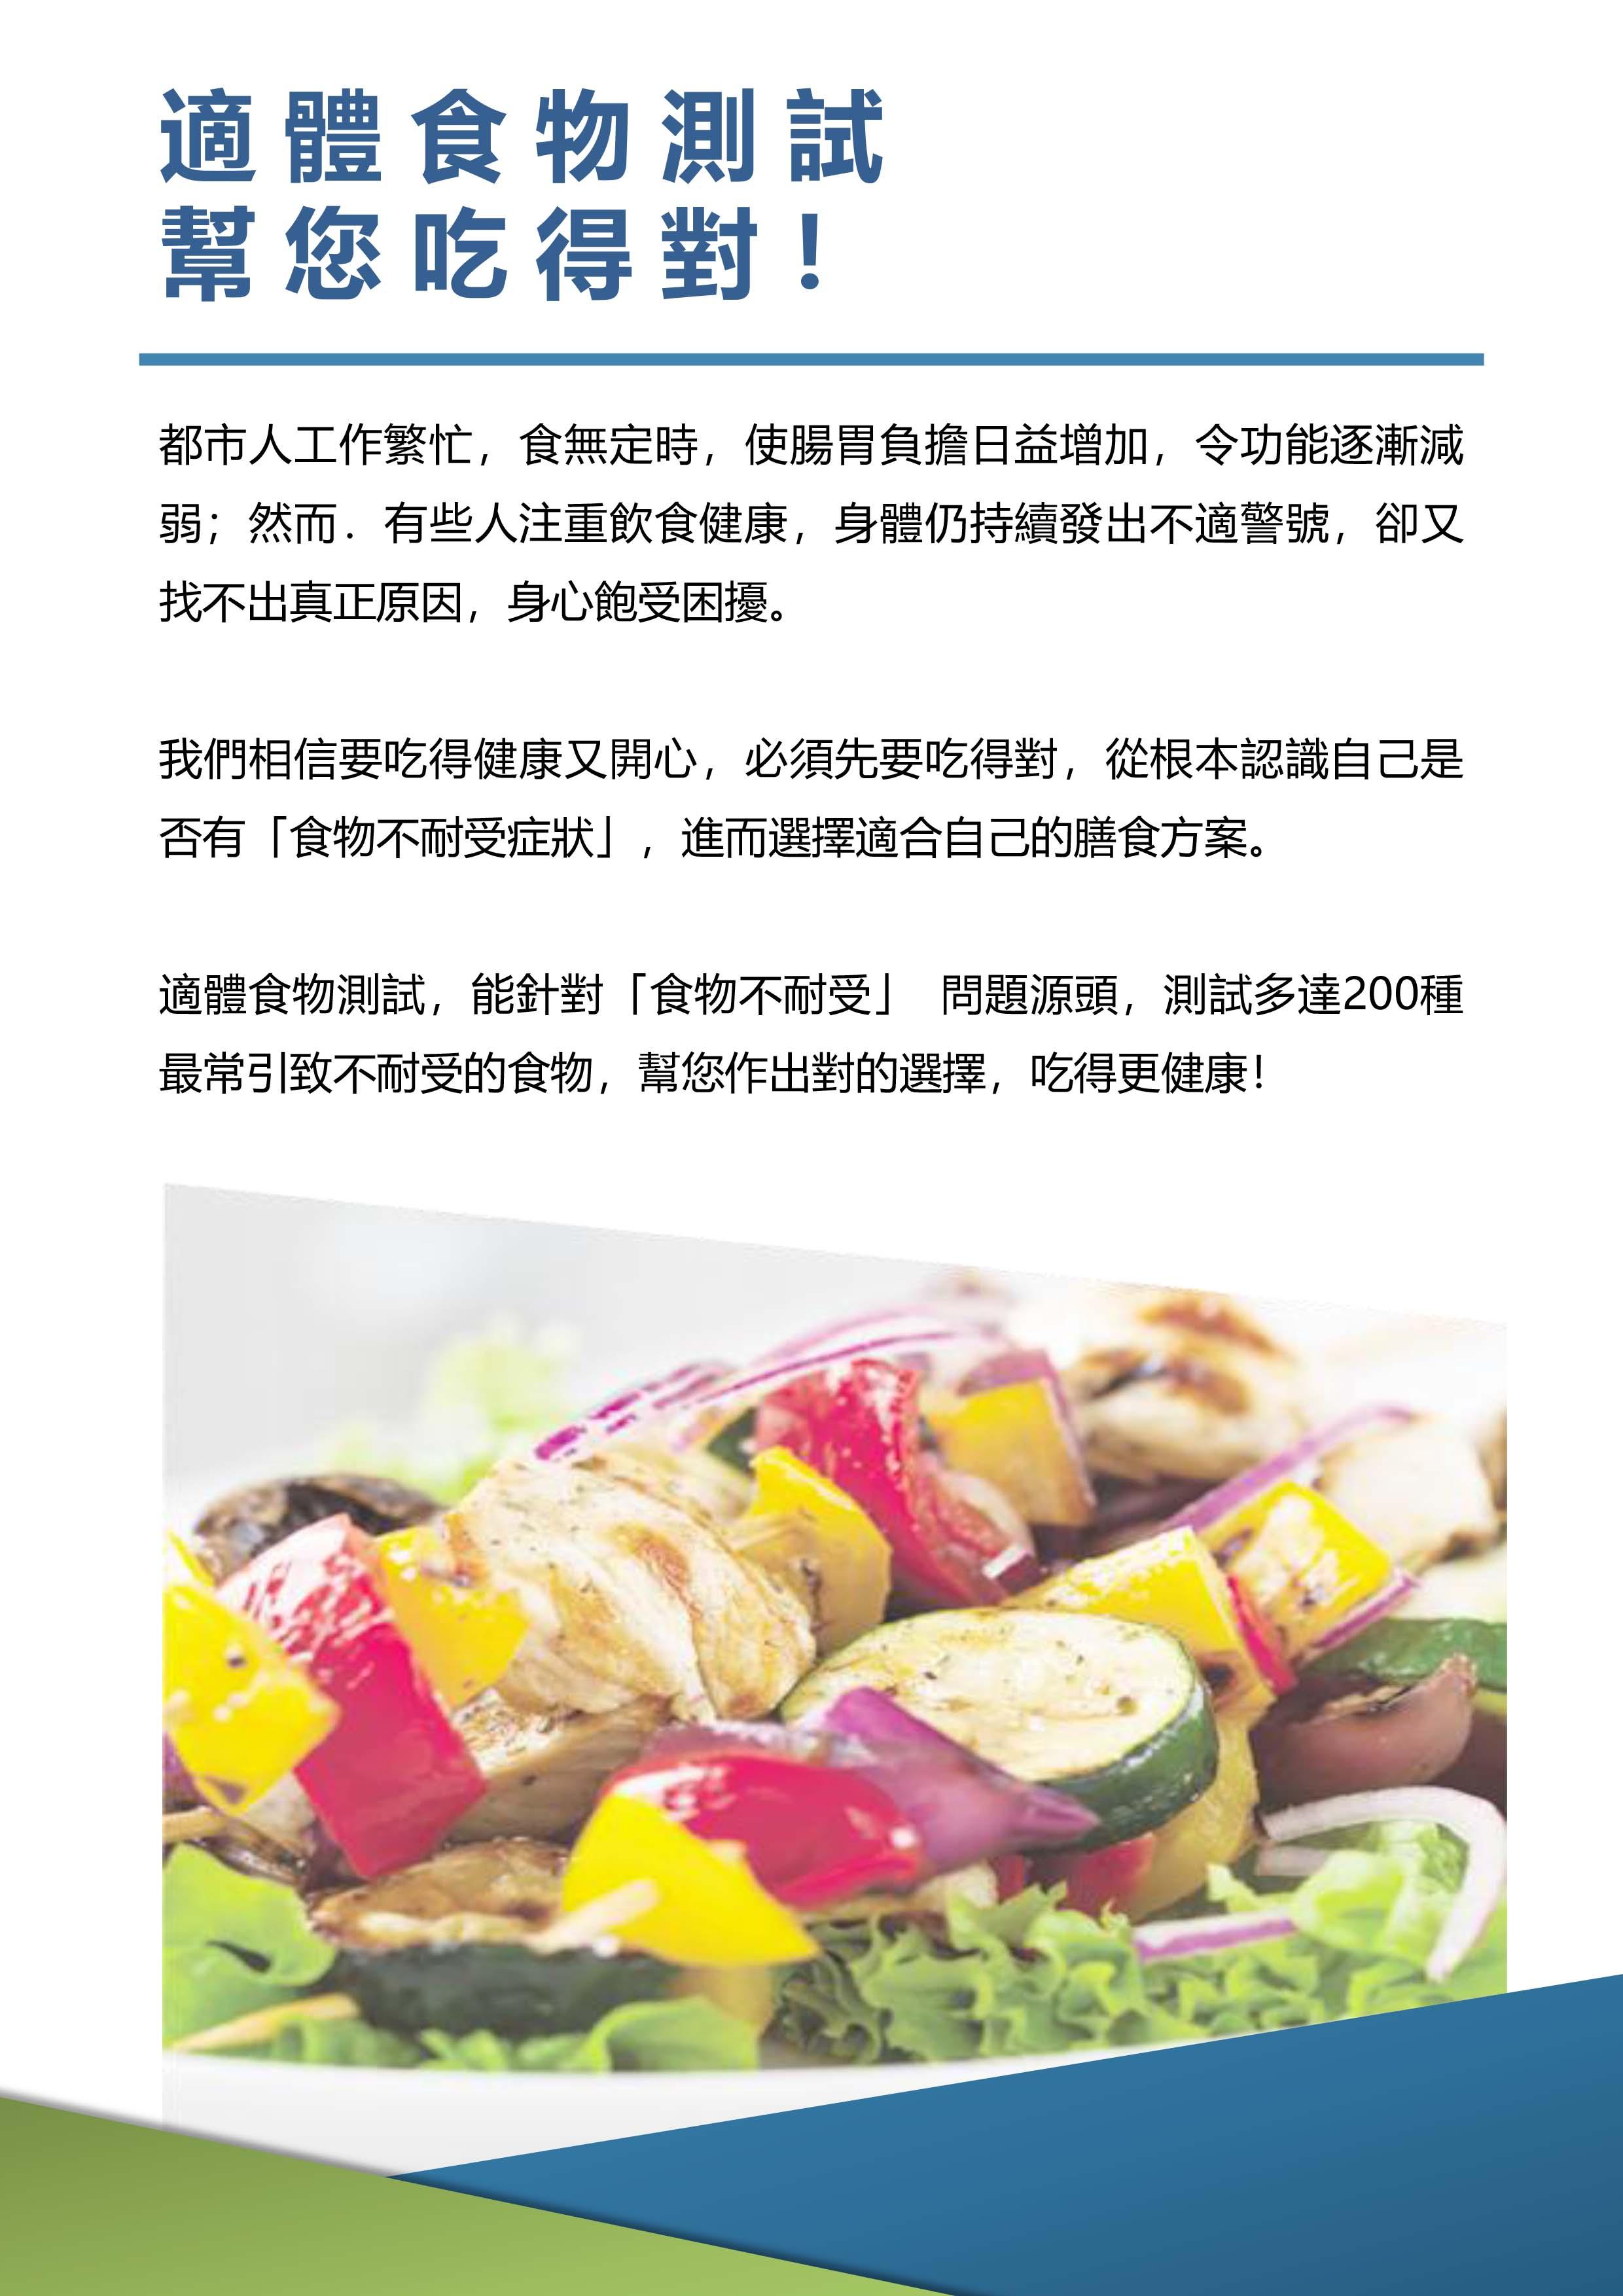 2b-food-intolerance-test-6.jpg